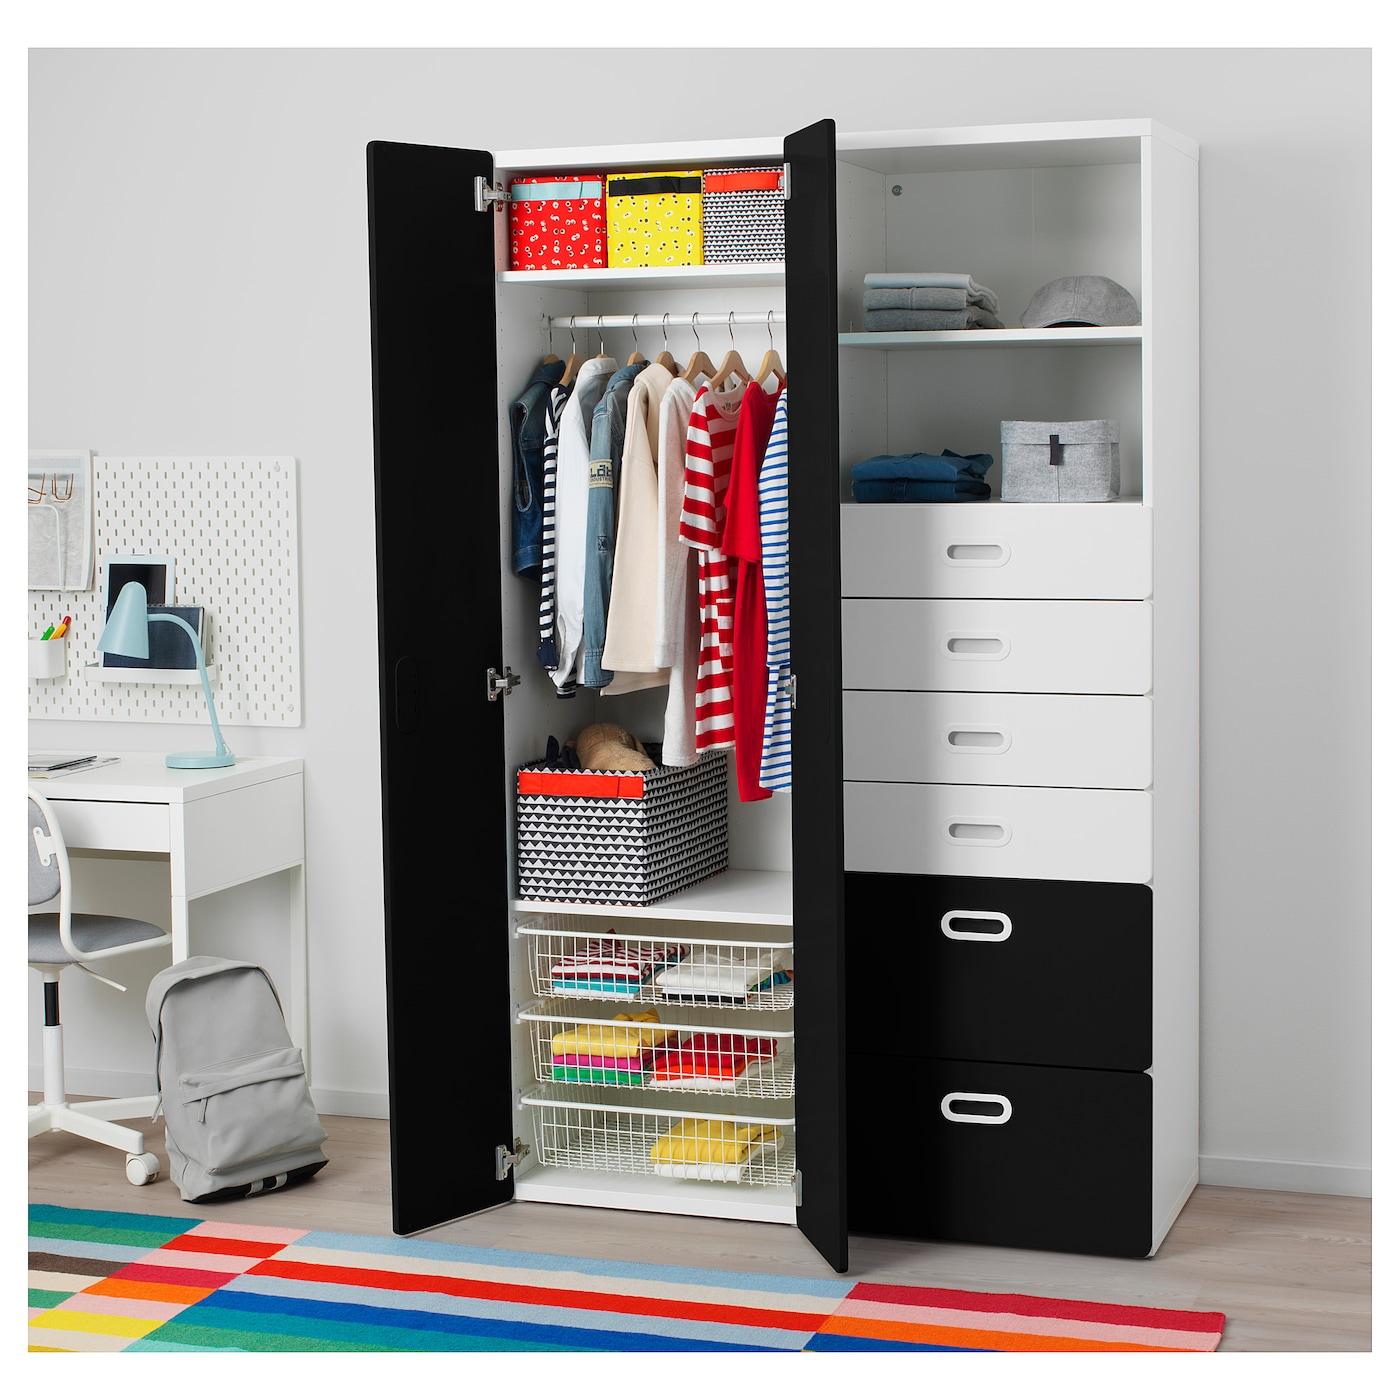 Fabulous Ikea Kledingkast With Stuva Kledingkast